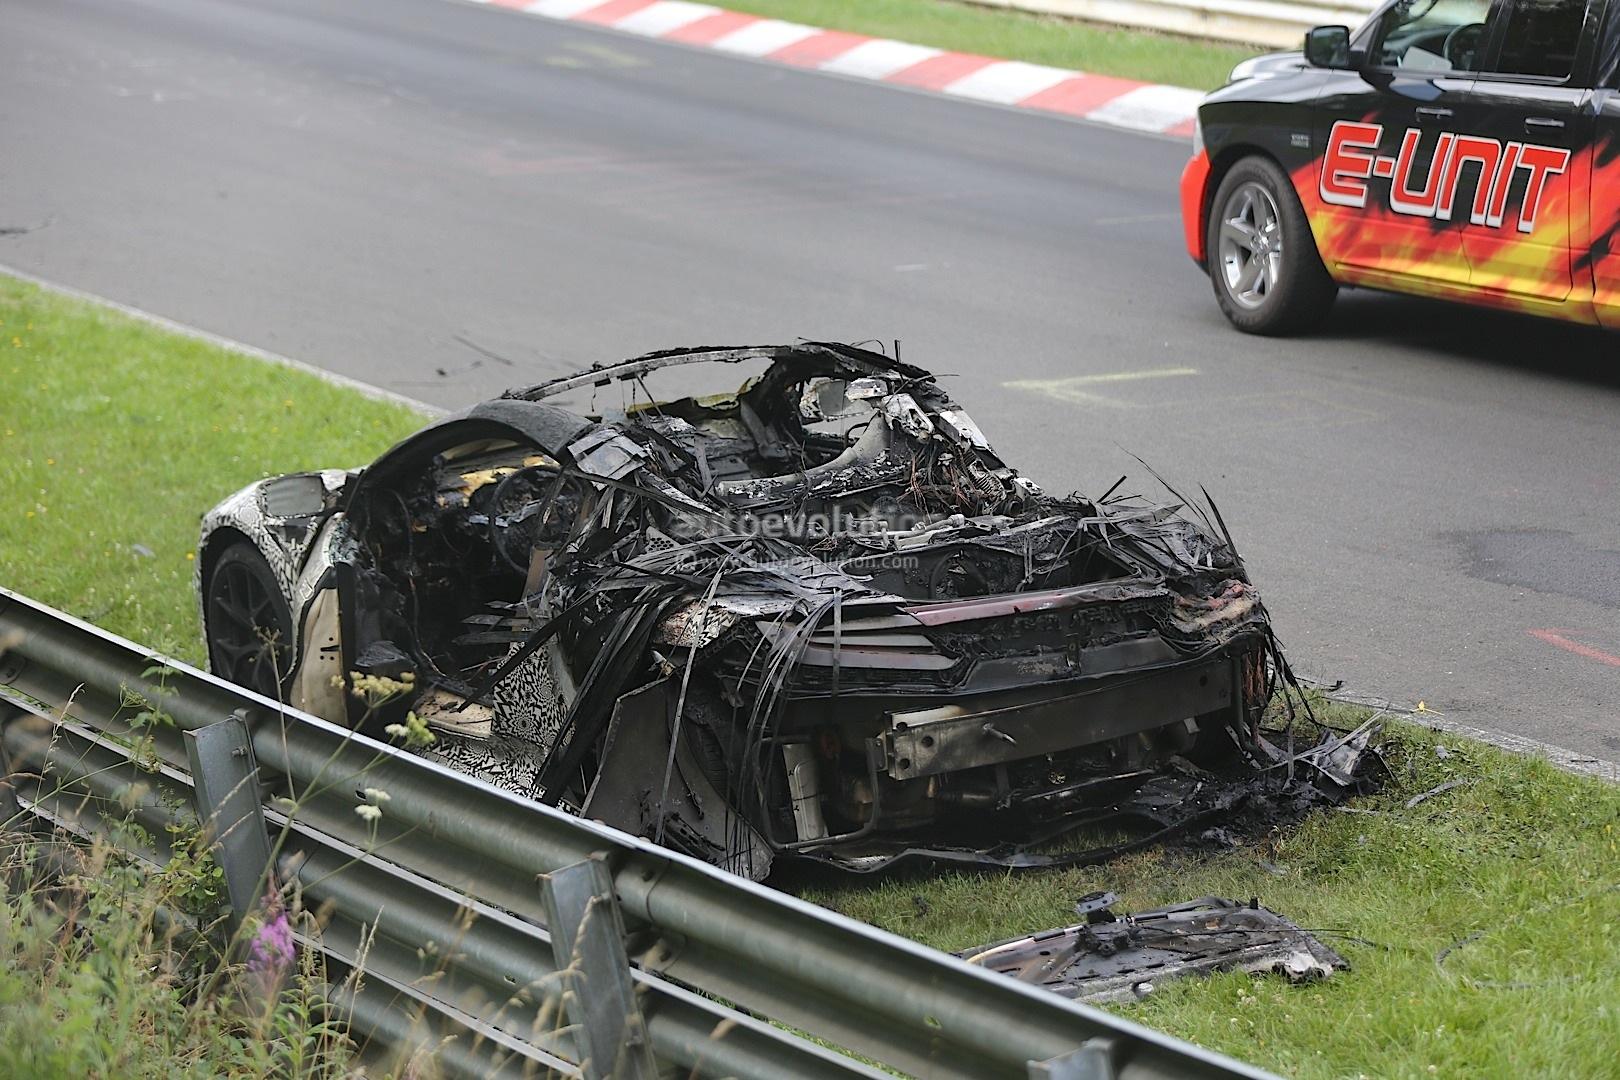 2015 Acura / Honda NSX Prototype Burns to a Crisp on Nurburgring ...